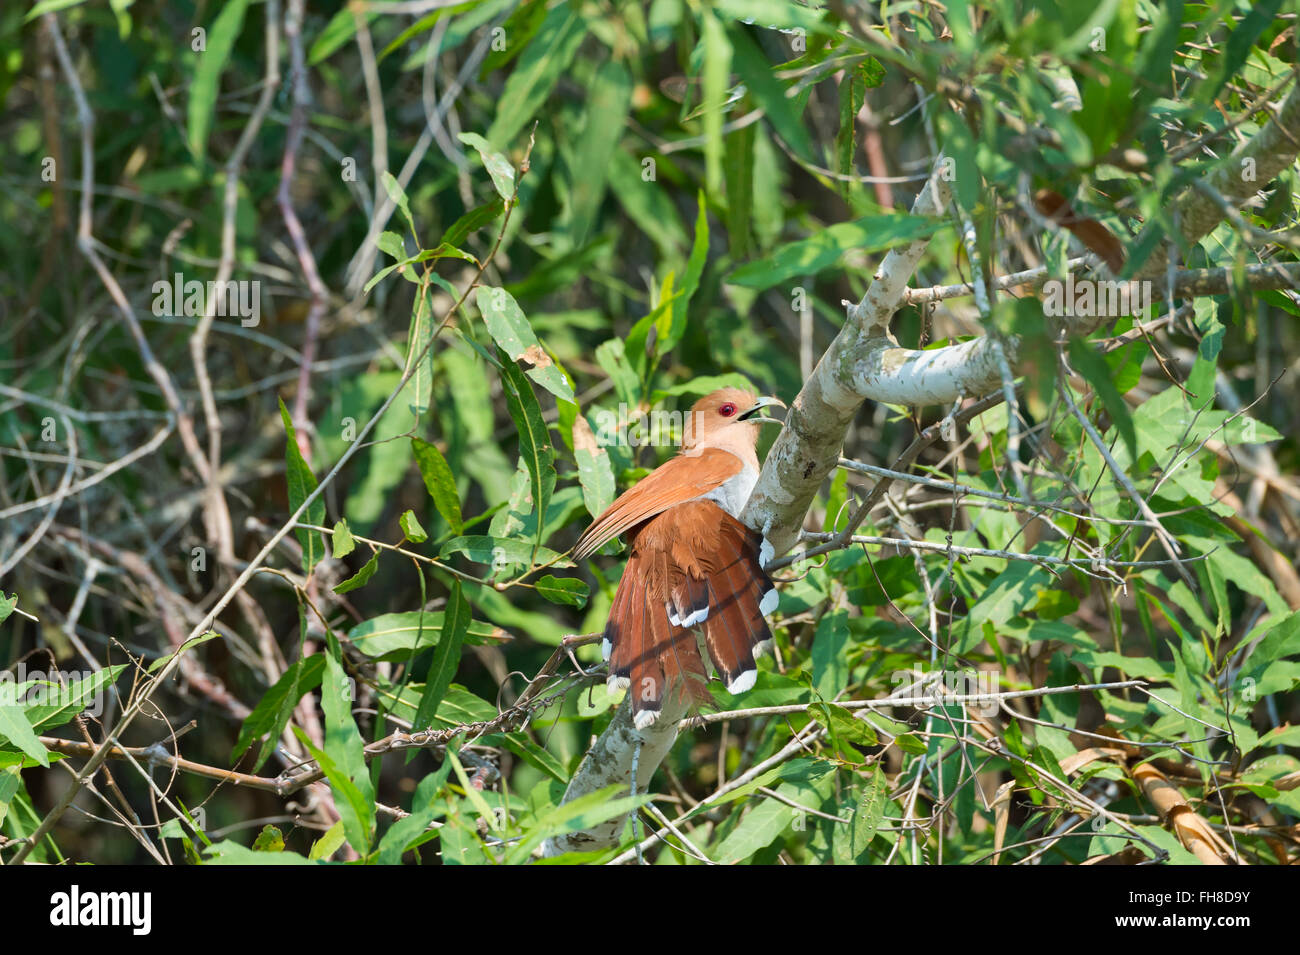 Guira Cuckoo (Guira guira), Pantanal, Mato Grosso, Brazil - Stock Image